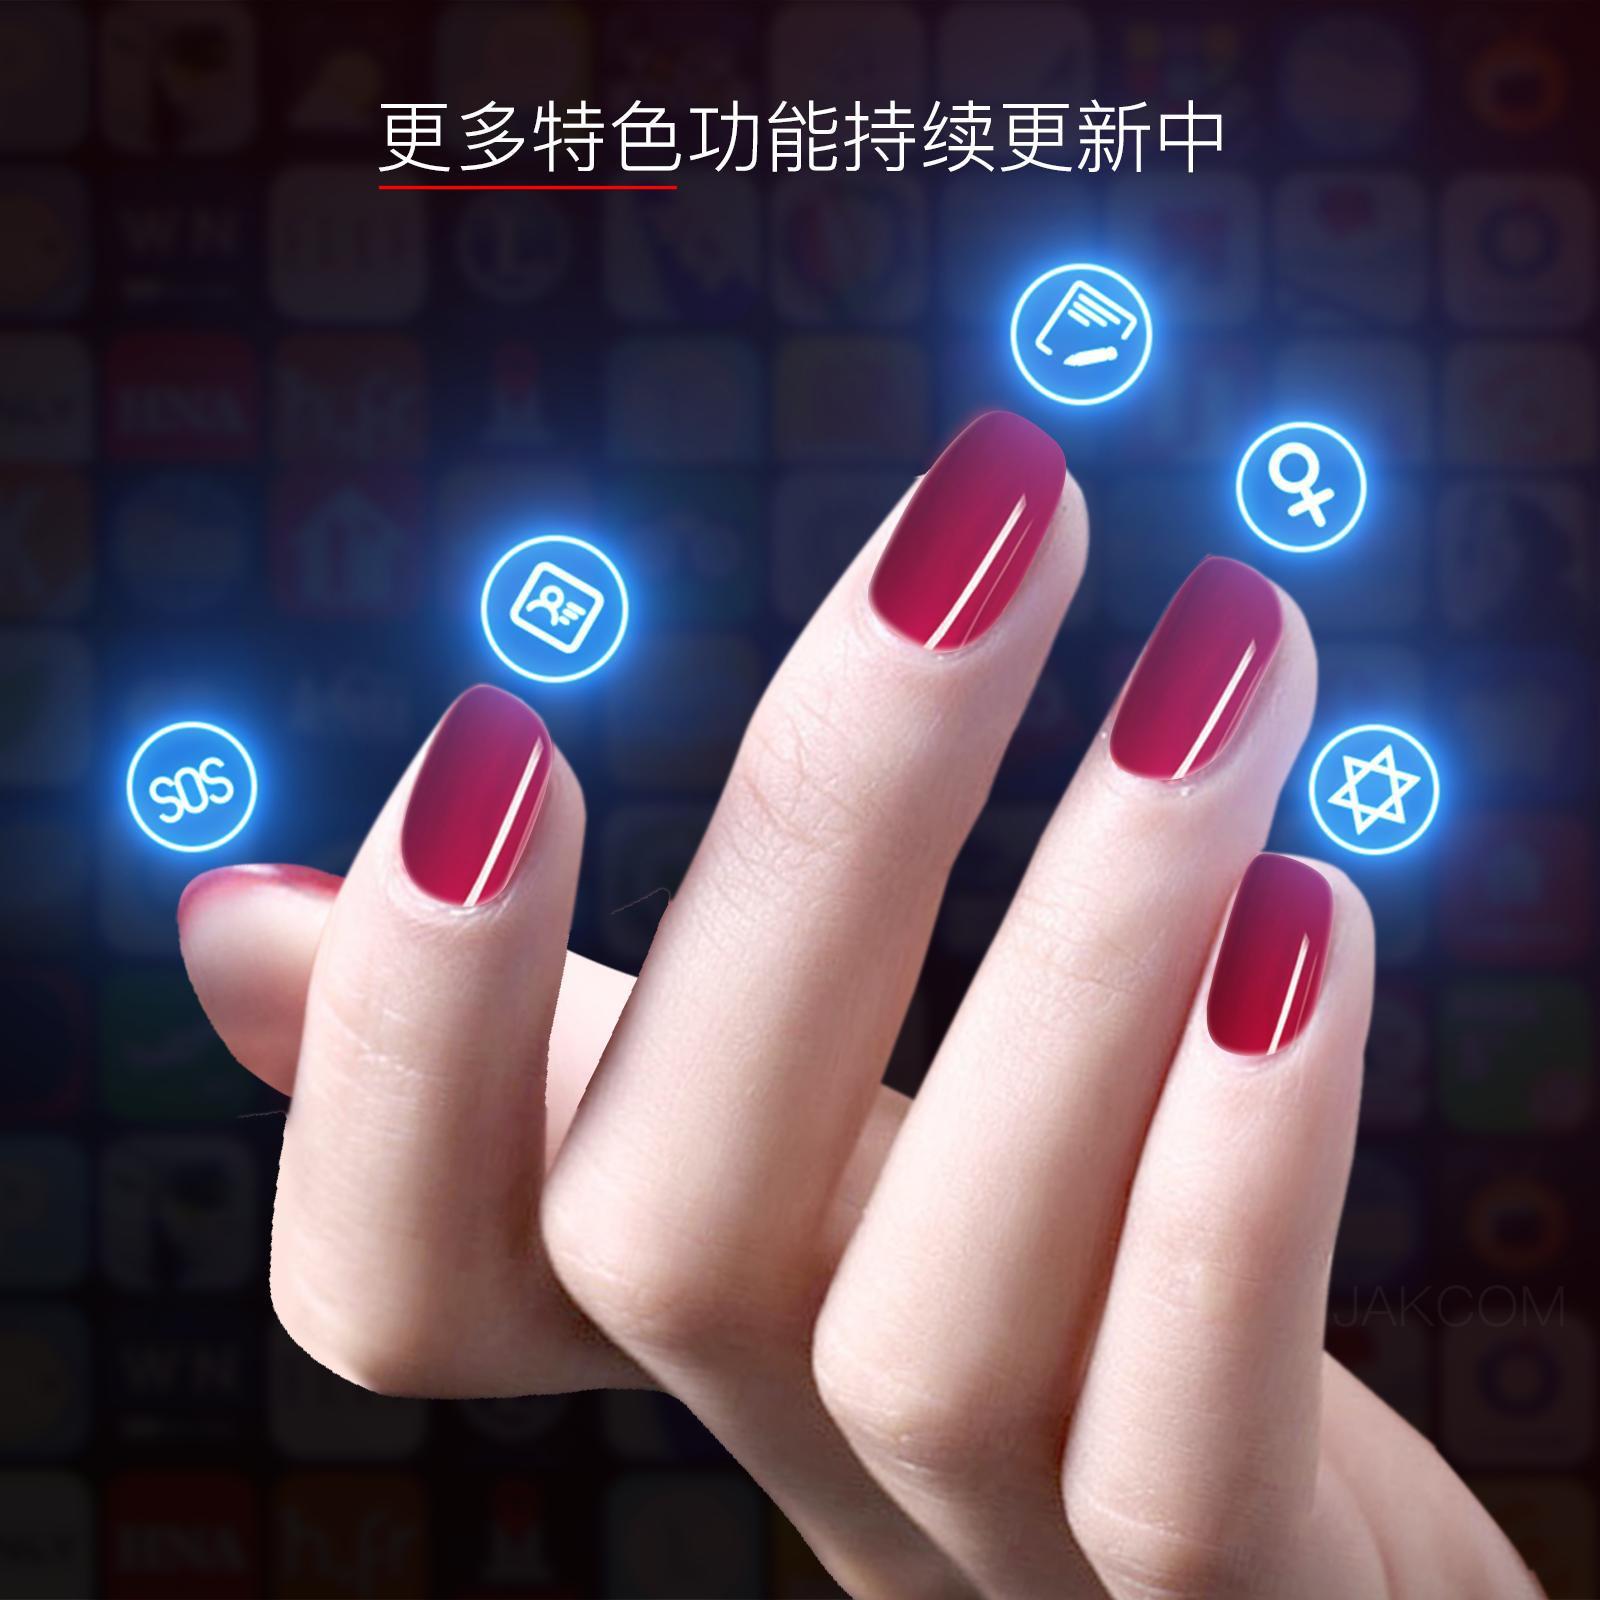 N3智能美甲片手环 适用FITNESSTRACKER深圳市双万科技有限公司P63